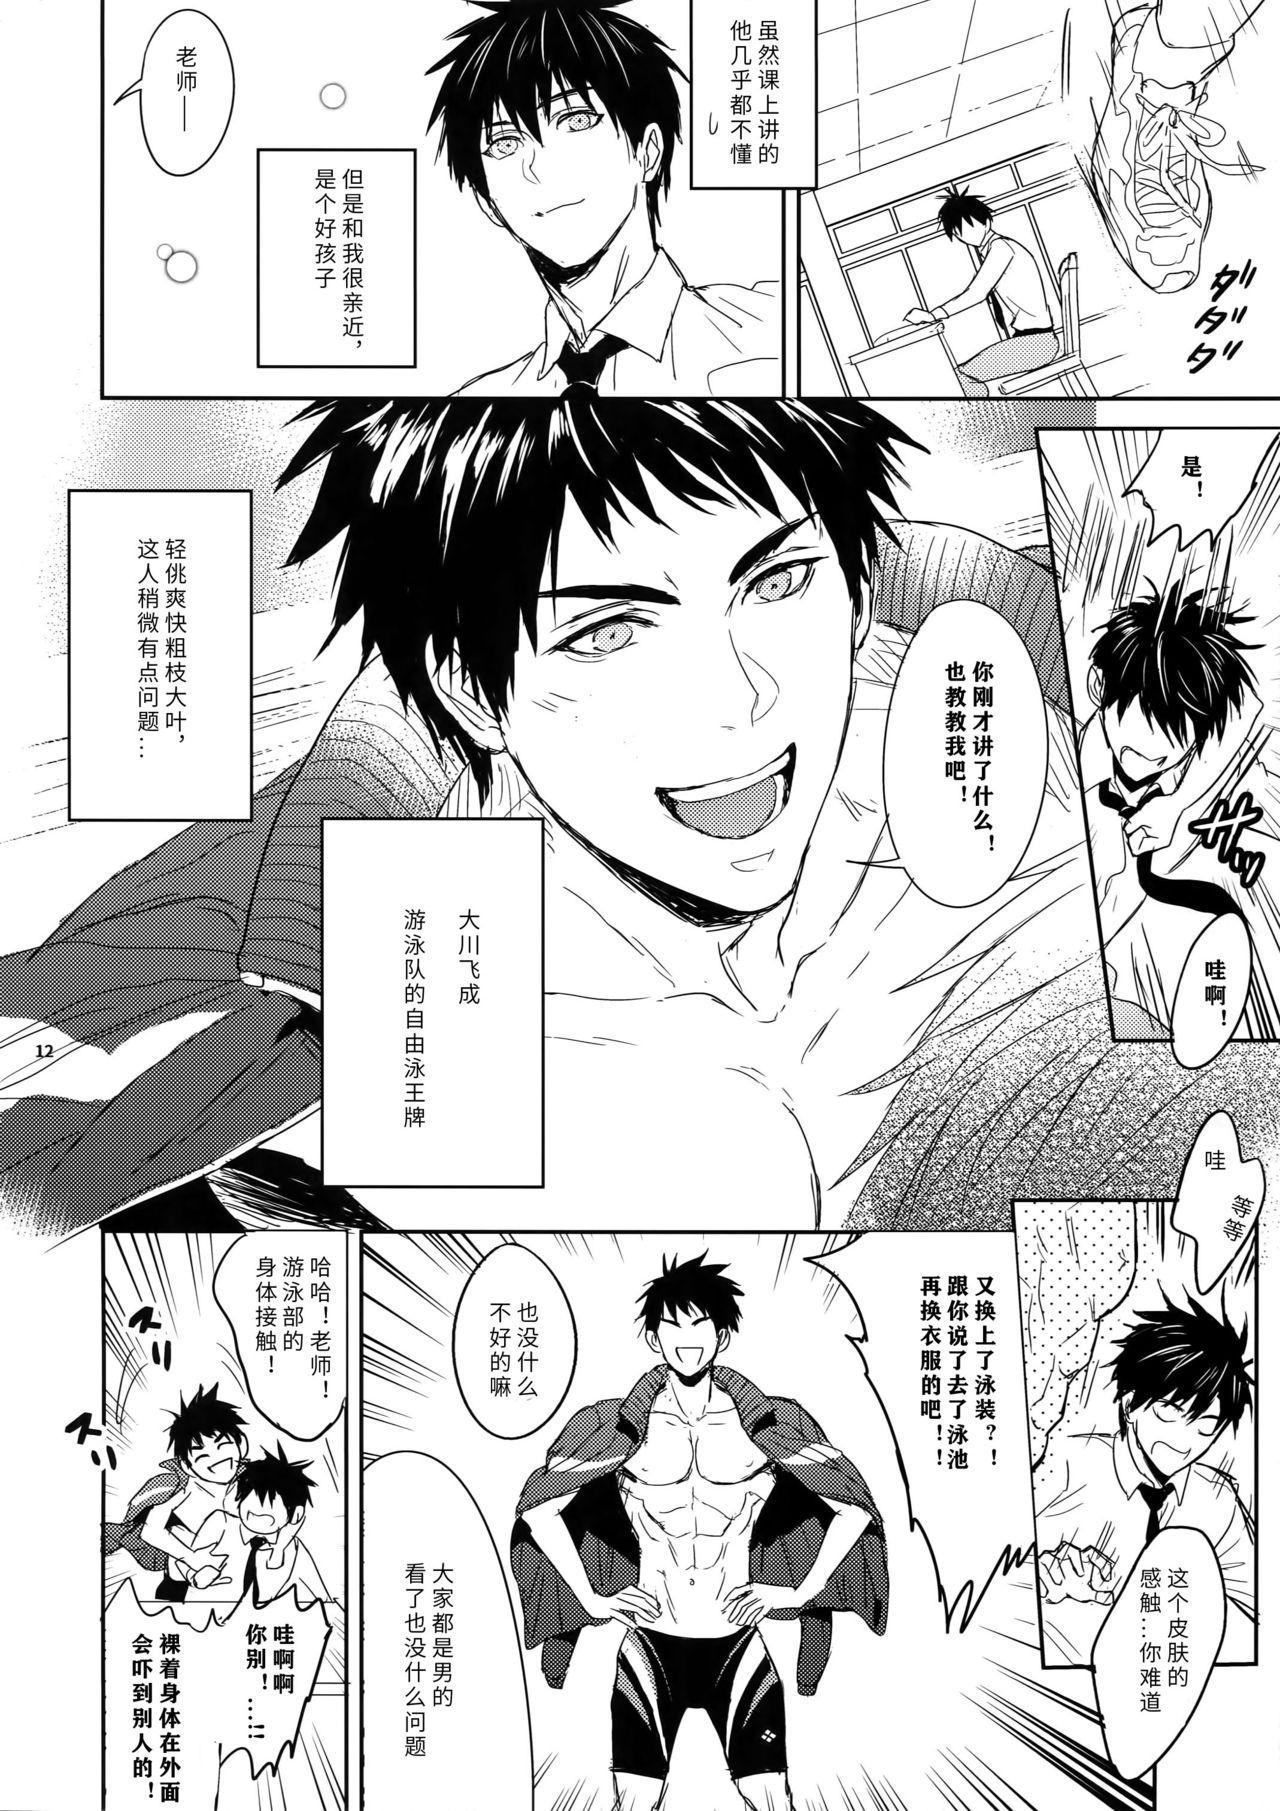 Sensei wa Nekketsu ga Areba Juubunda! | 老师只要热血就够了! 11